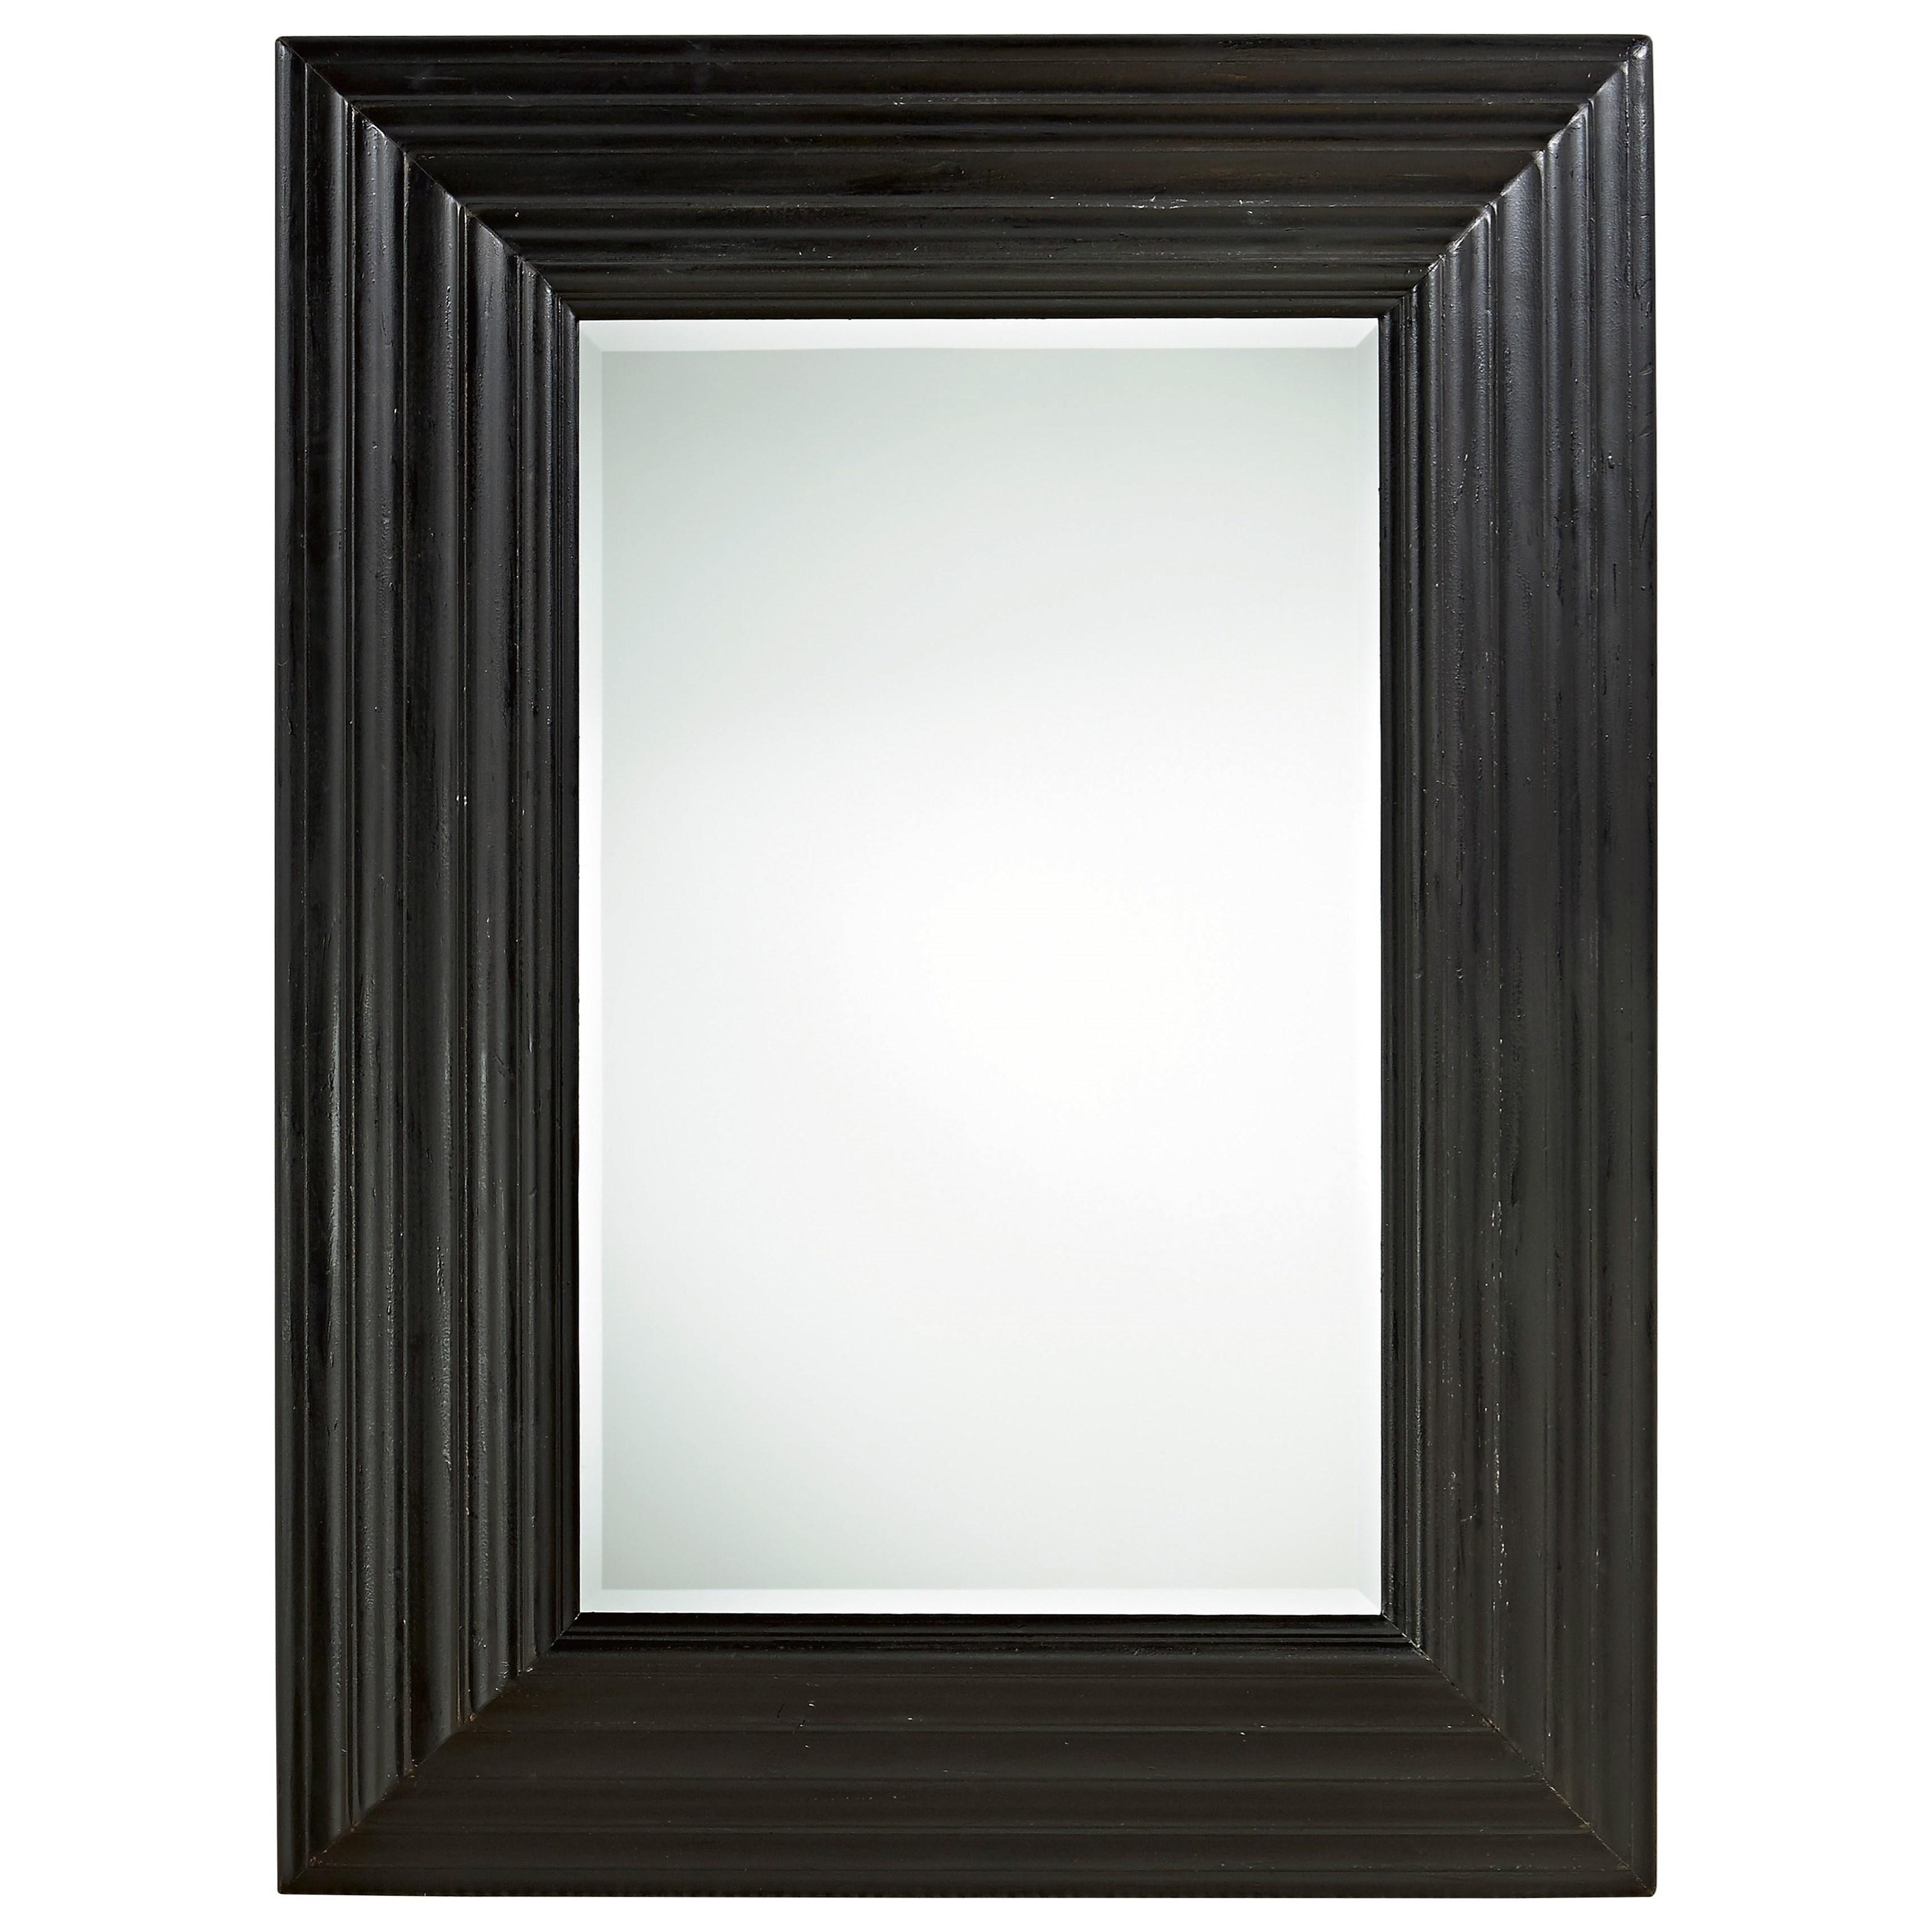 Morris Home Furnishings Gramercy Gramercy Park Portrait Mirror - Item Number: 572A04M